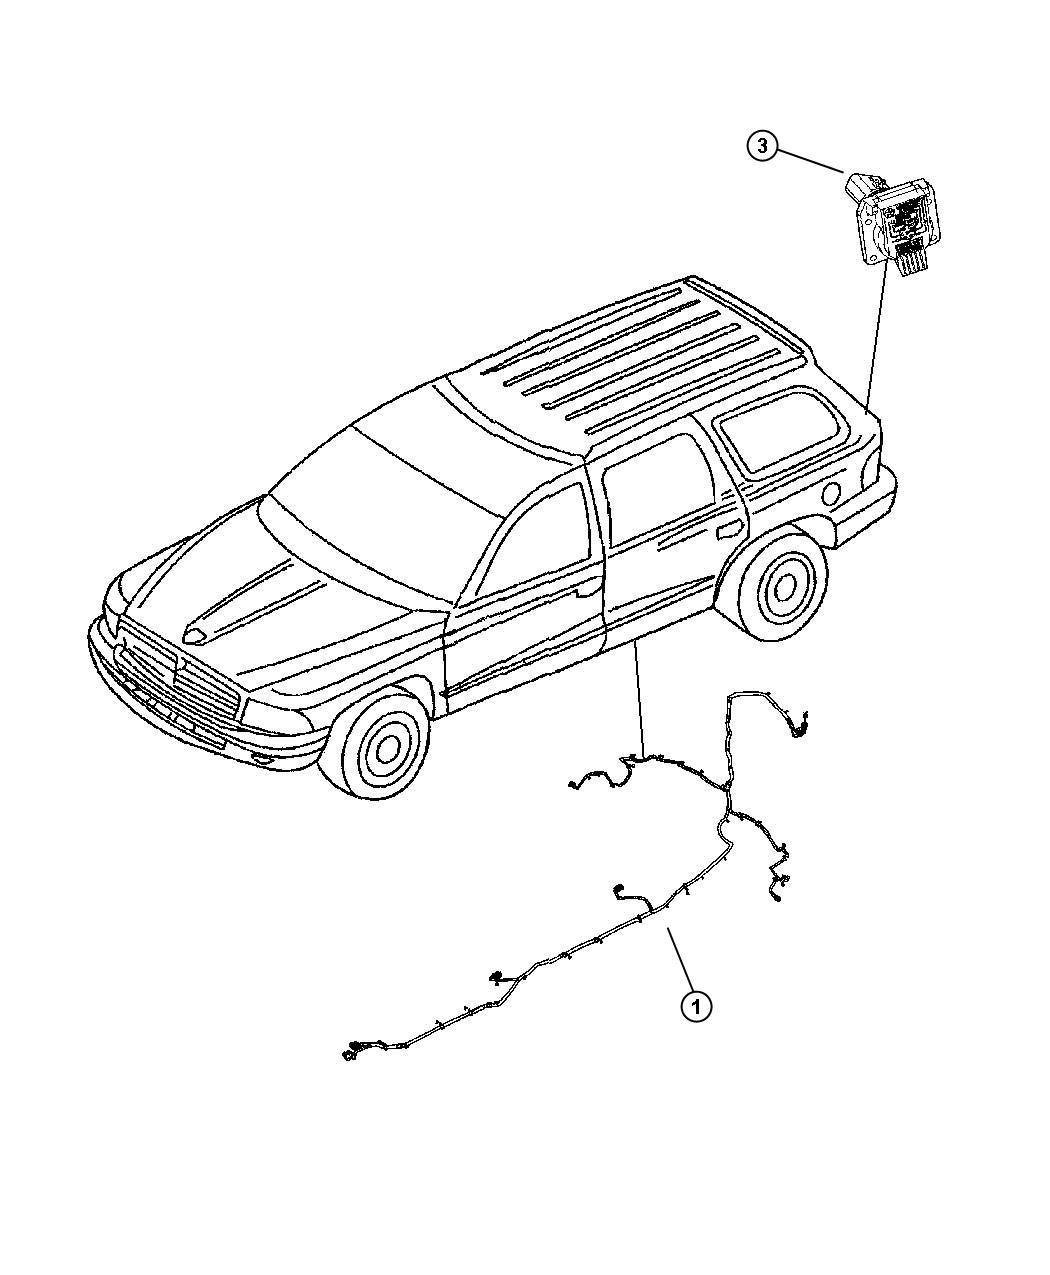 Dodge Durango Wiring. Trailer tow. Pigtail, ahc